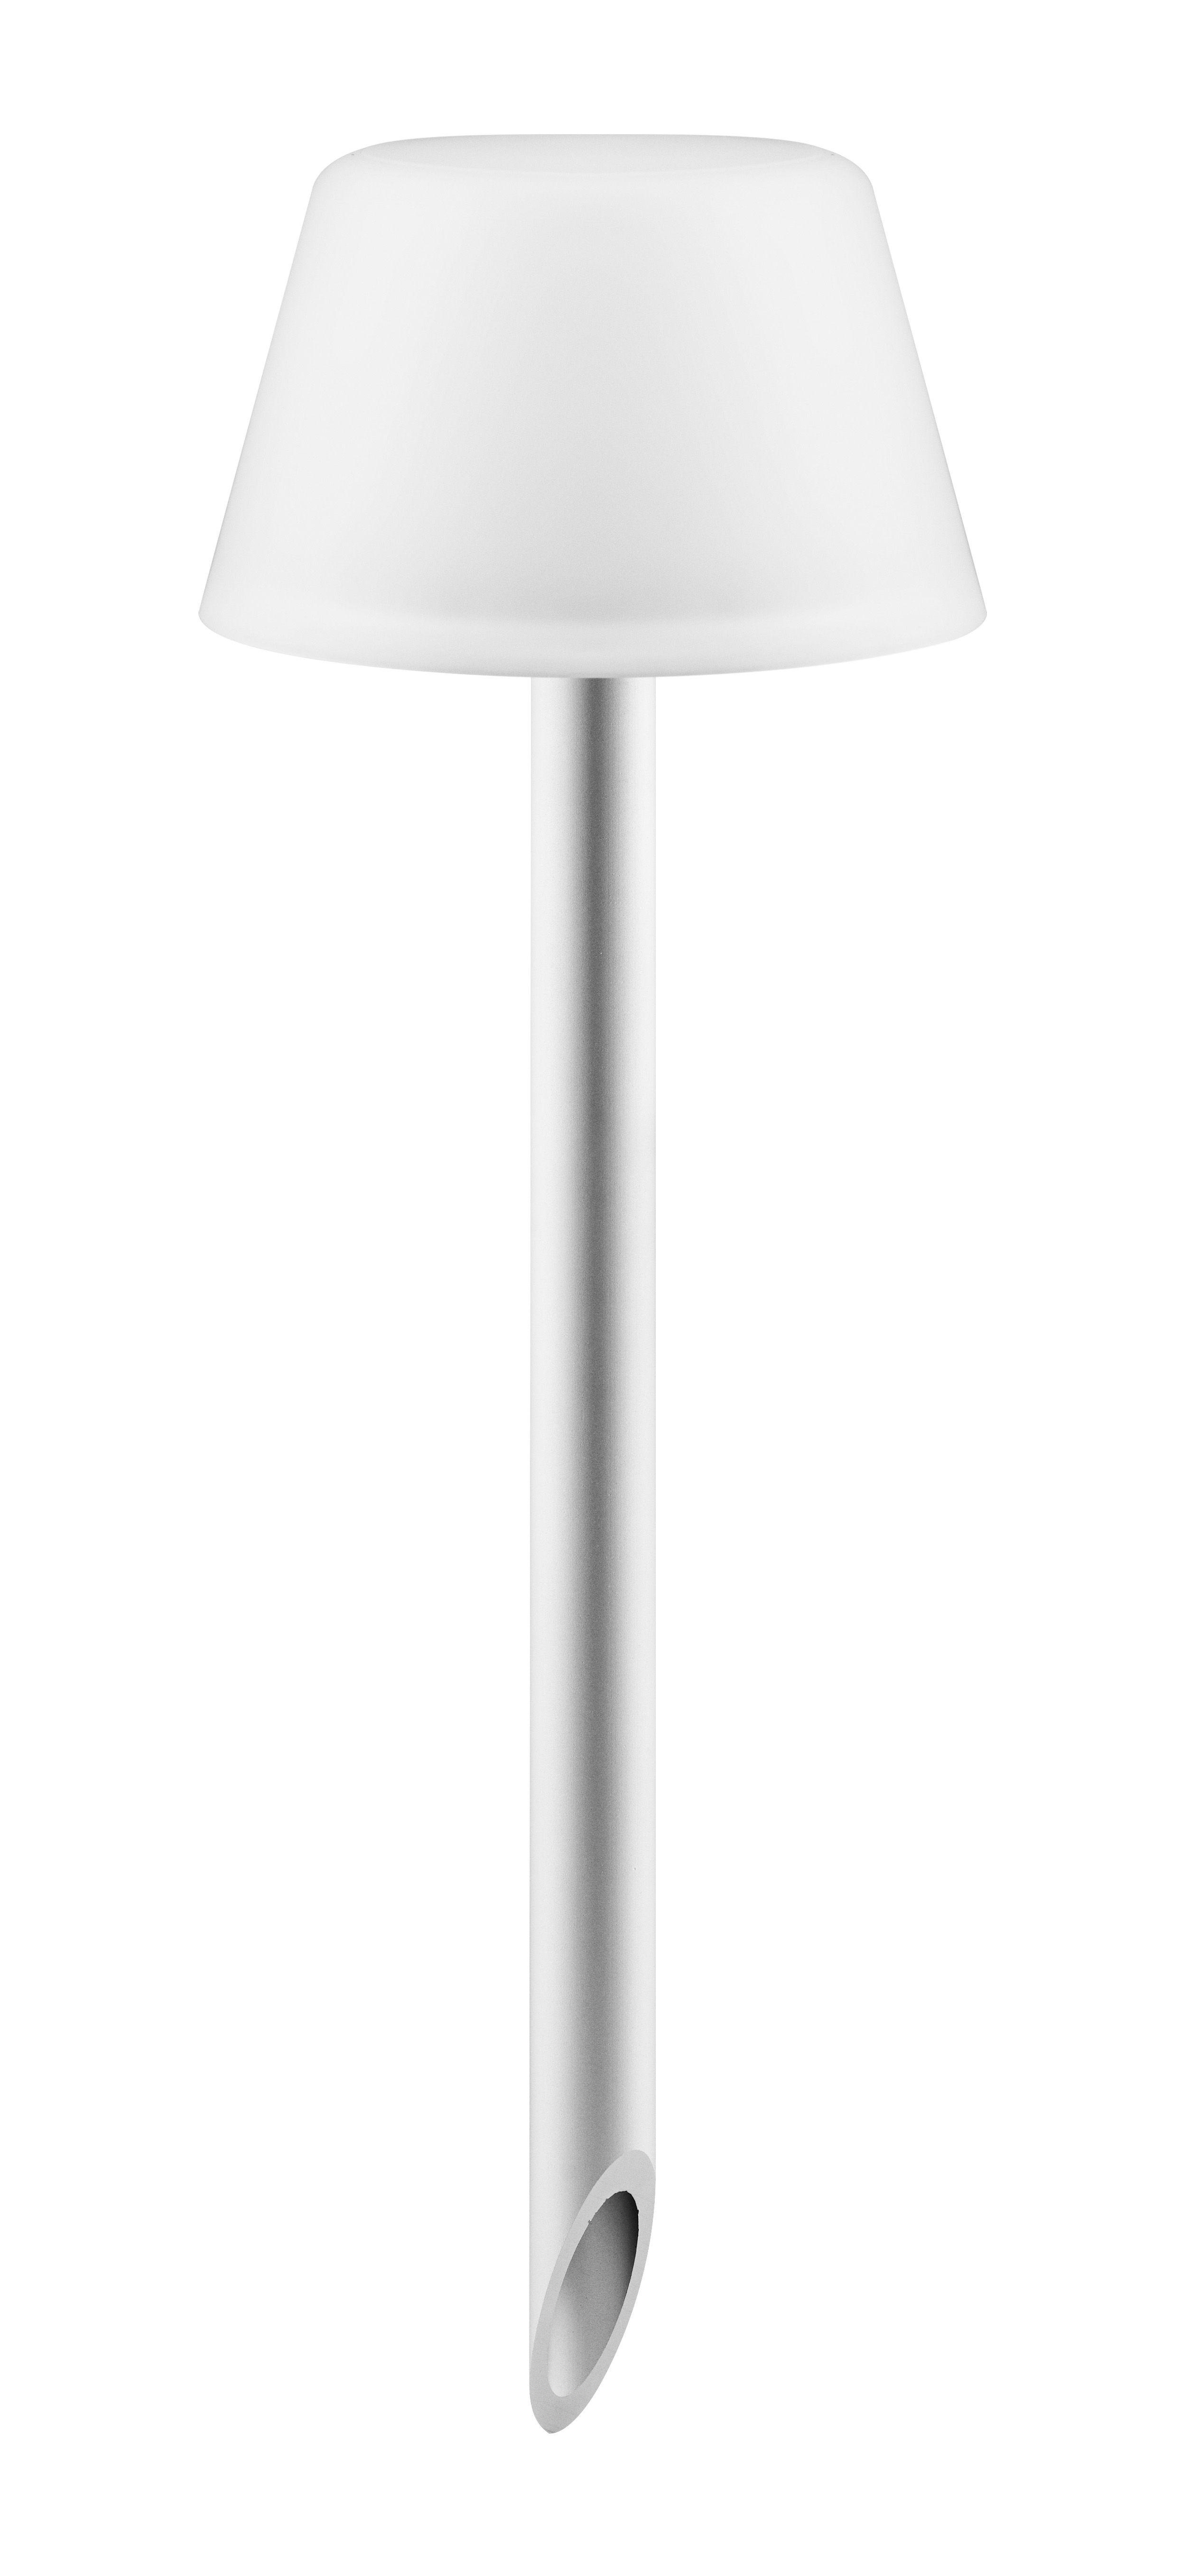 Lighting - Outdoor Lighting - Sunlight Lamp by Eva Solo - White / aluminium - Anodized aluminium, Frosted glass